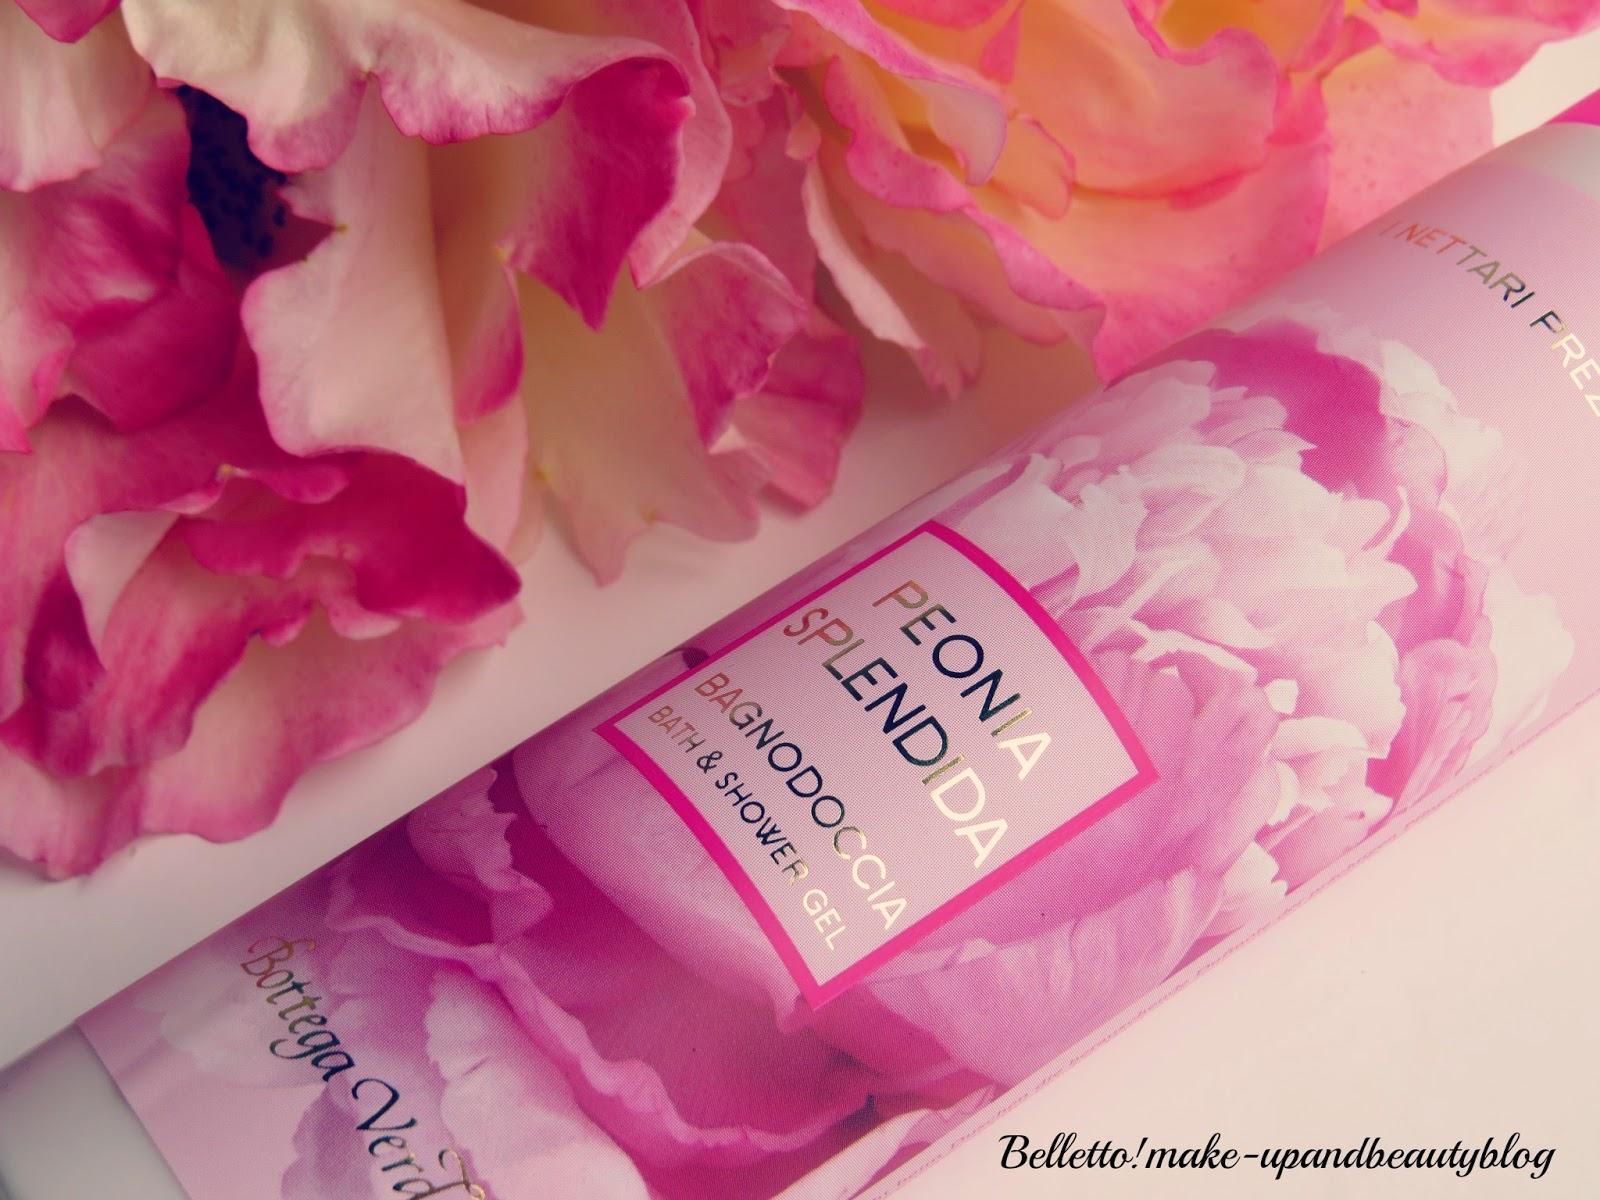 Bagno Doccia Bottega Verde : Belletto! make up and beauty blog: bottega verde peonia splendida